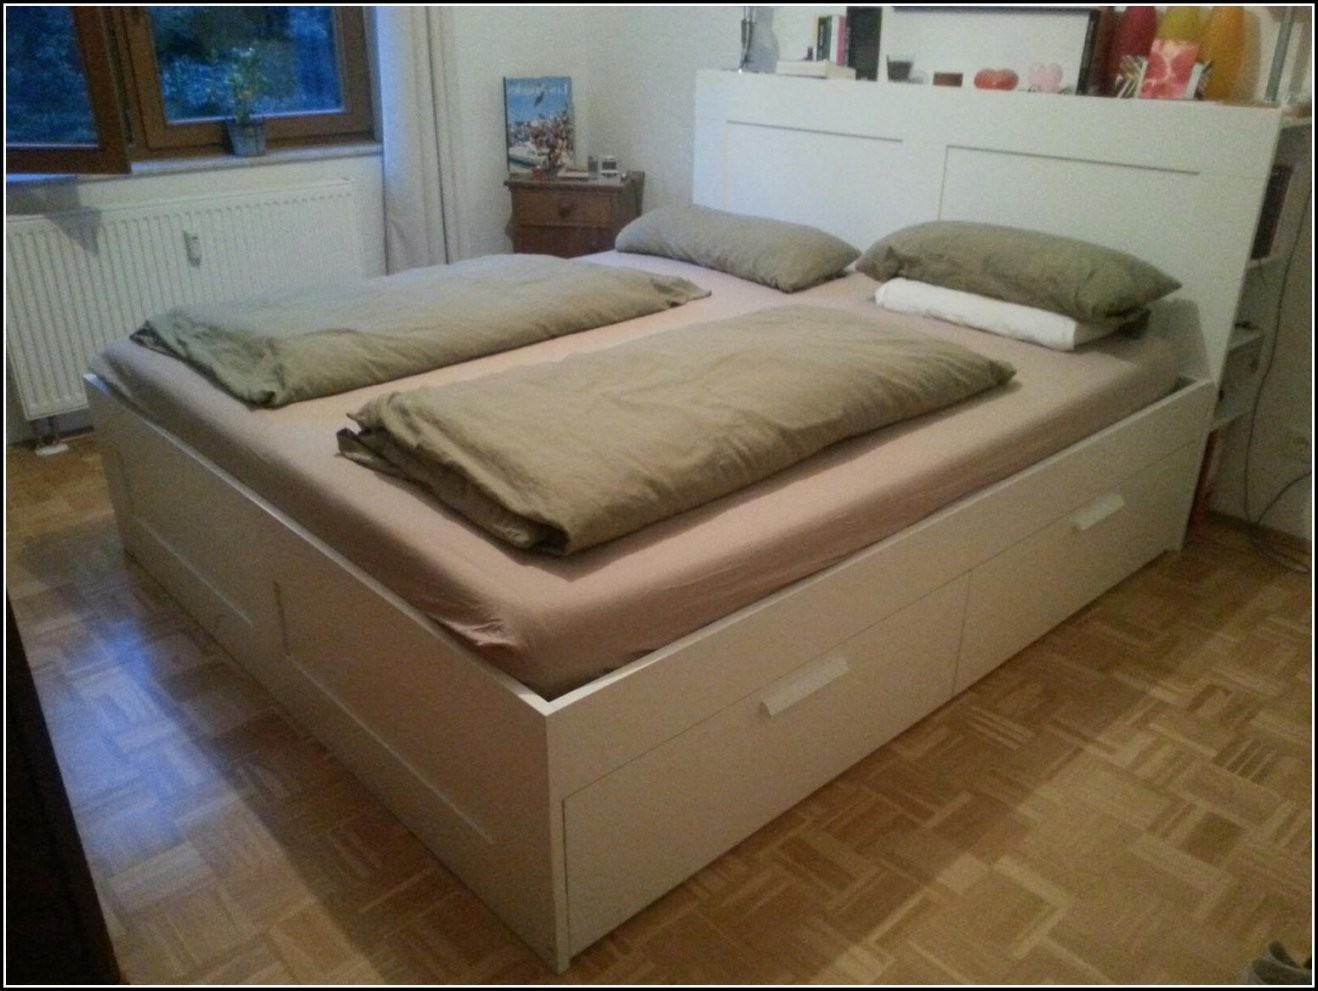 Bettgestell Hoch Atemberaubend Malm Bettgestell Hoch 180X200 Cm Ikea von Bett 180X200 Hoch Photo